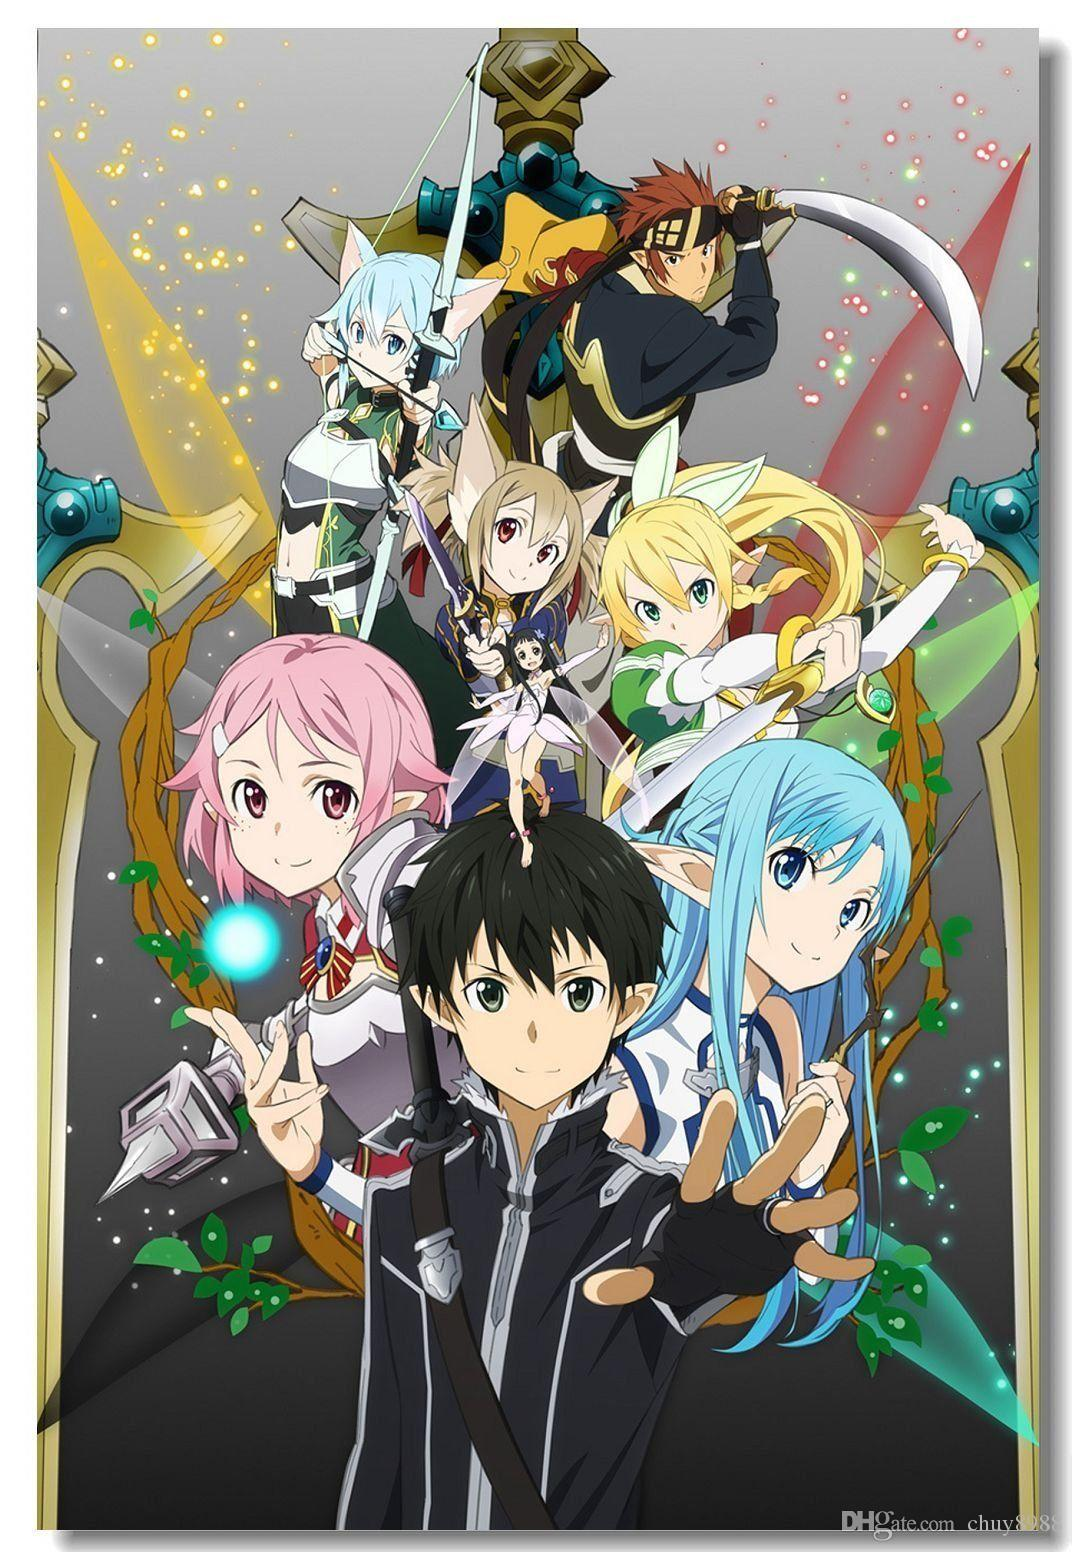 Sword Art Online 1 2 Kazuto SAO Sinon Asuna Boy Art Seda Poster 20x30 24x36 24x43